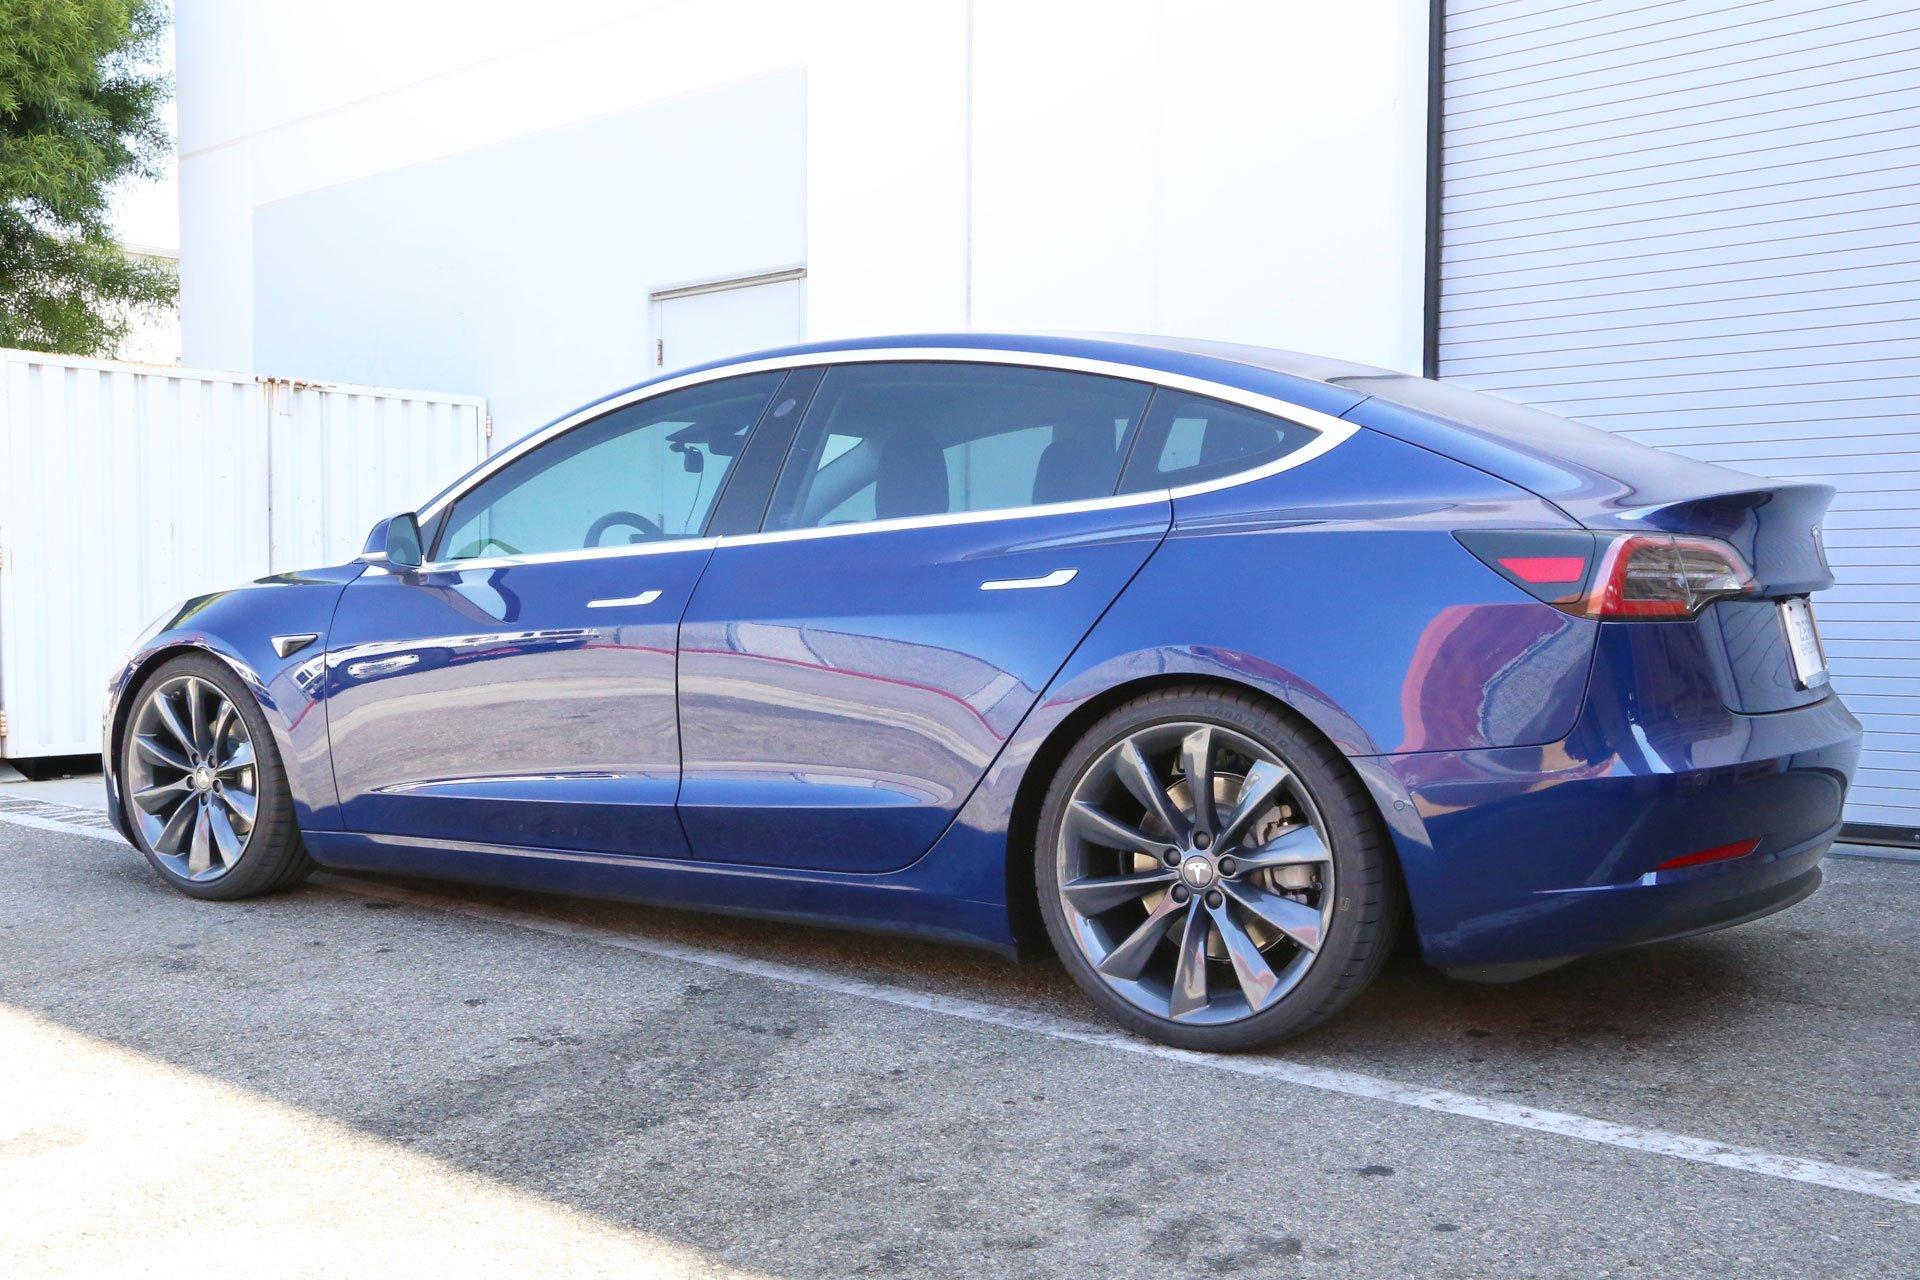 EVWheel_Direct_20inch_Metallic_Grey_EVT_Turbine_Wheels_Tesla_Model_3-Blue__003_2000x